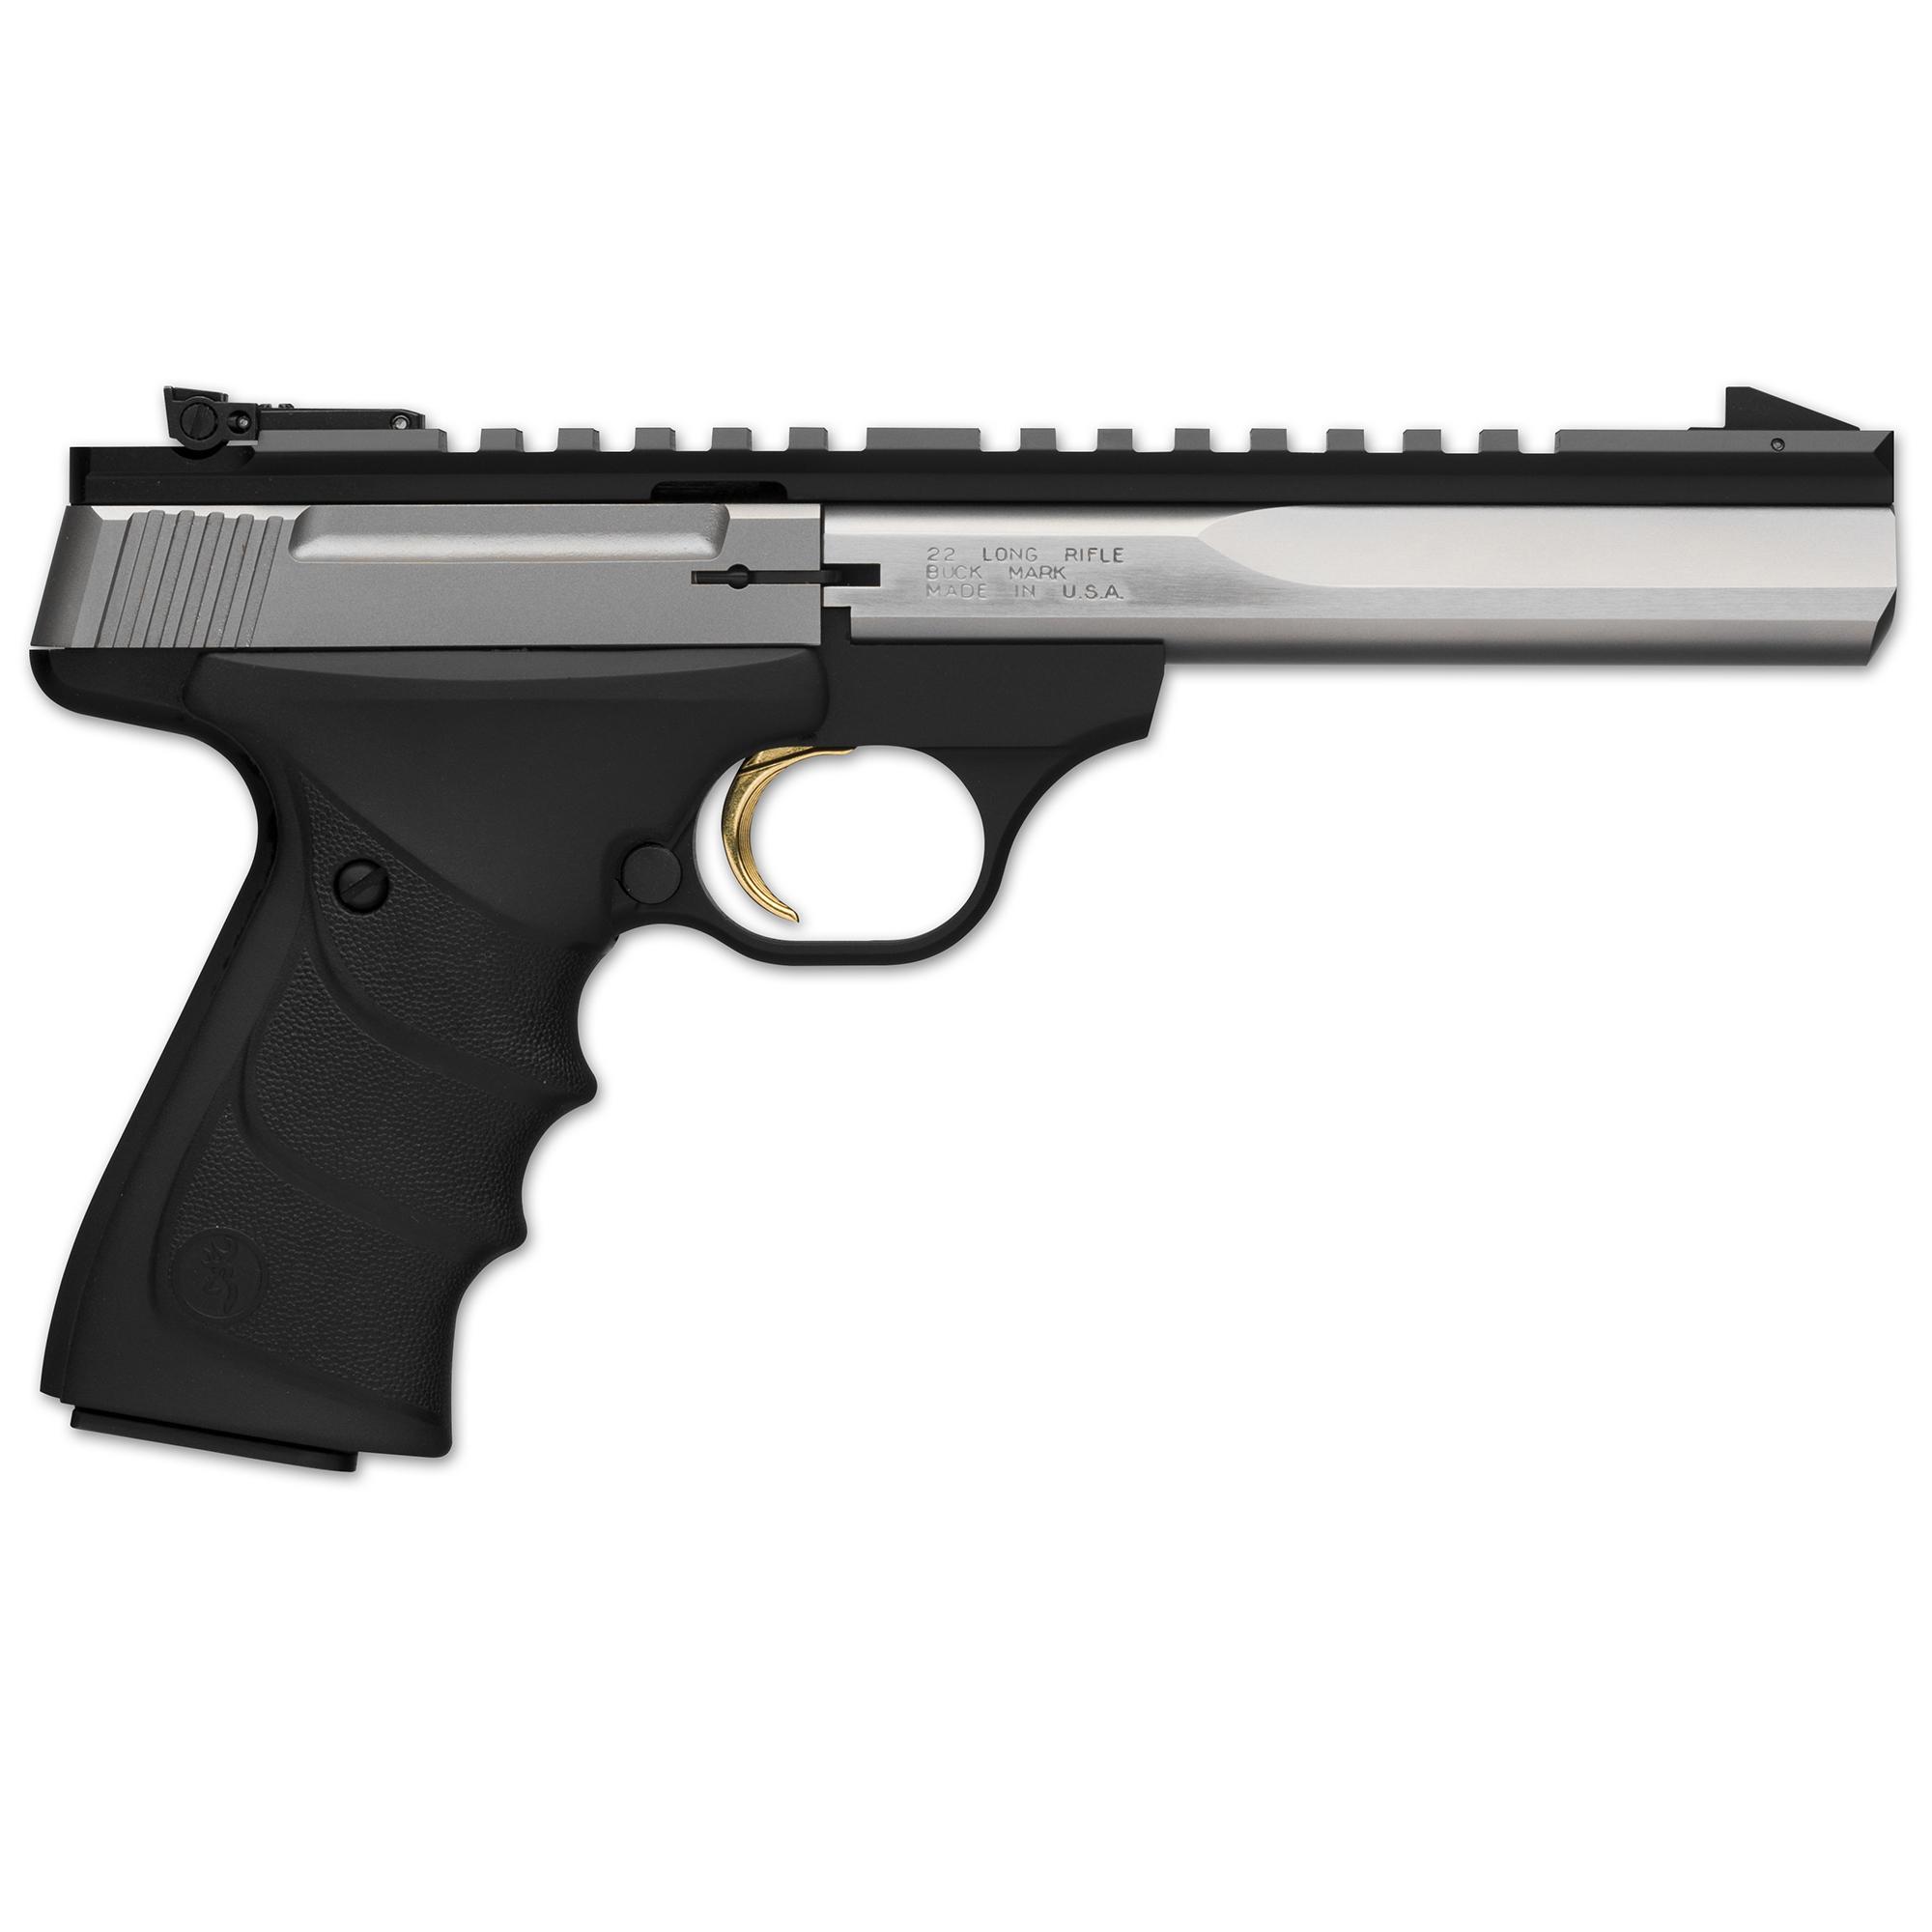 "Browning Buck Mark Contour Stainless Handgun, 5.5"" BBL thumbnail"